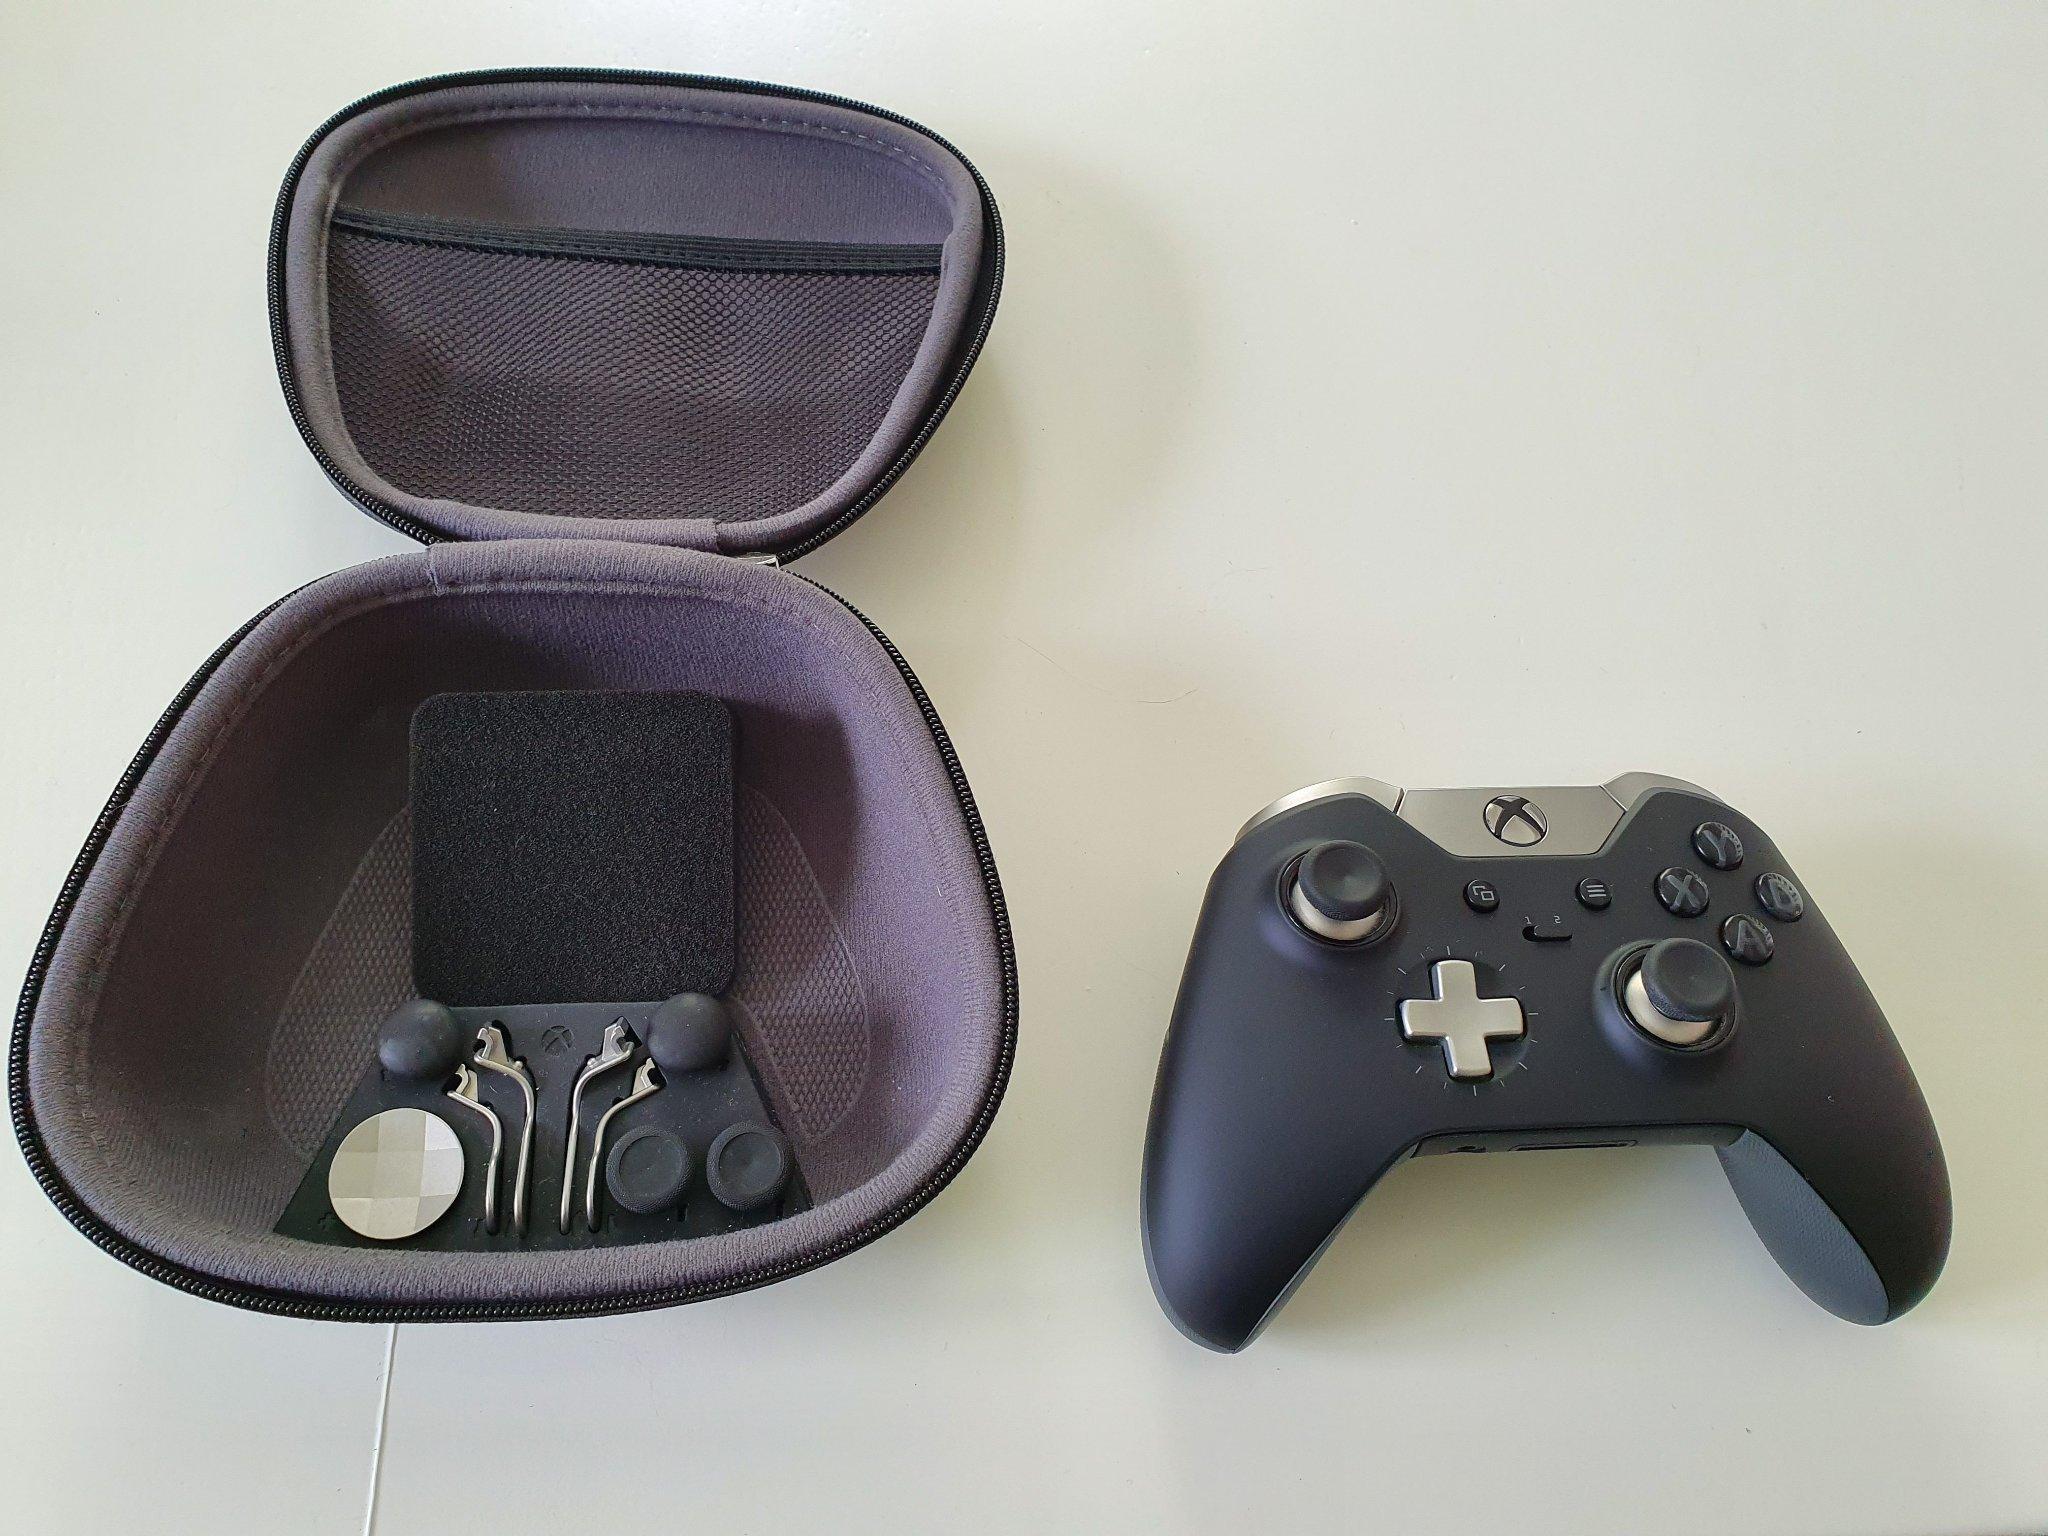 cae64b651fe Xbox one elite kontroll (354416707) ᐈ Köp på Tradera